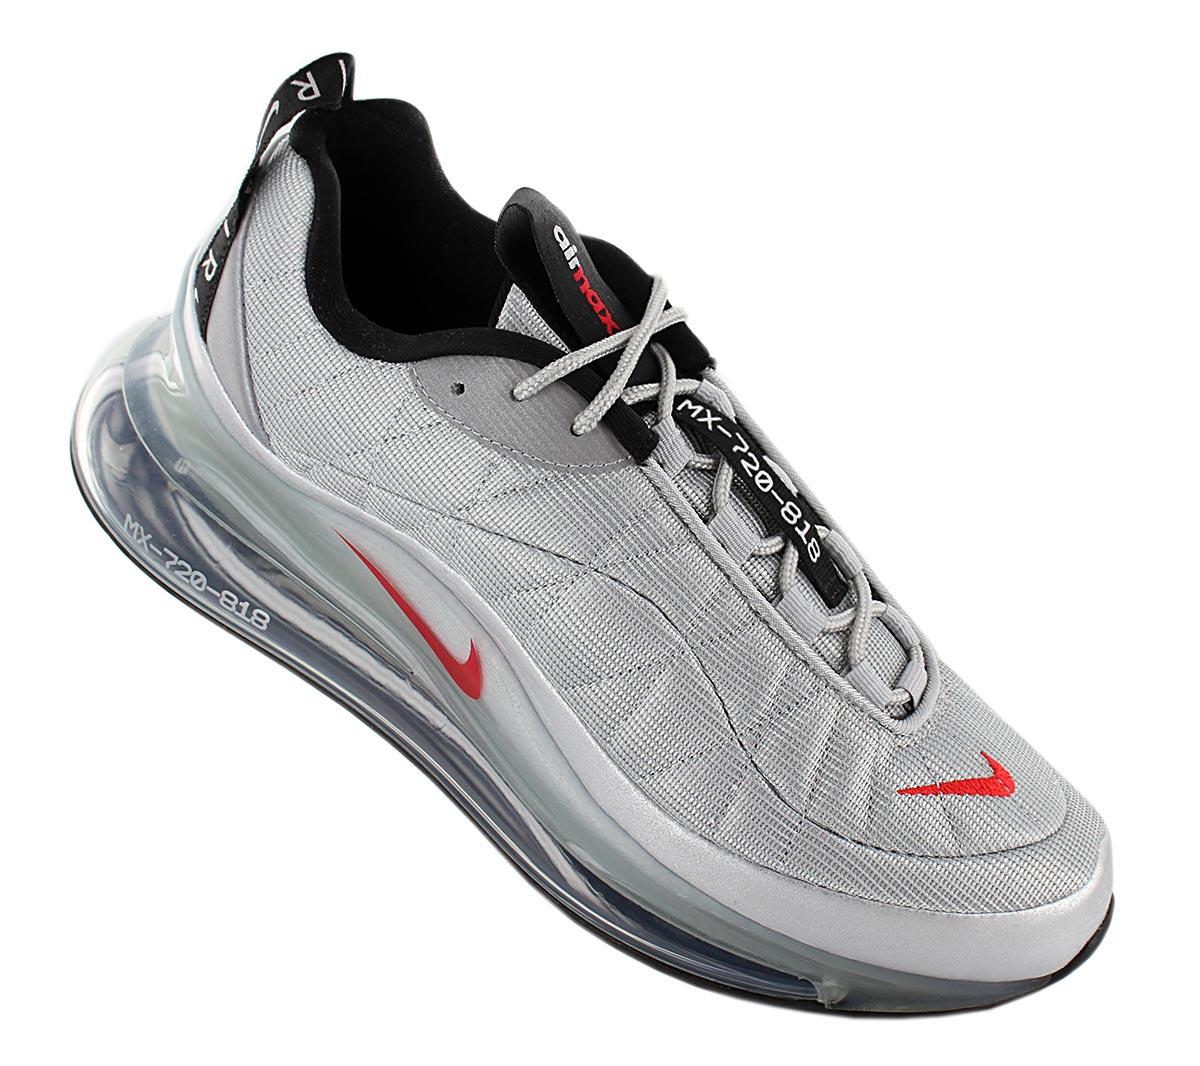 NEW Nike MX-720-818 - Silver Bullet